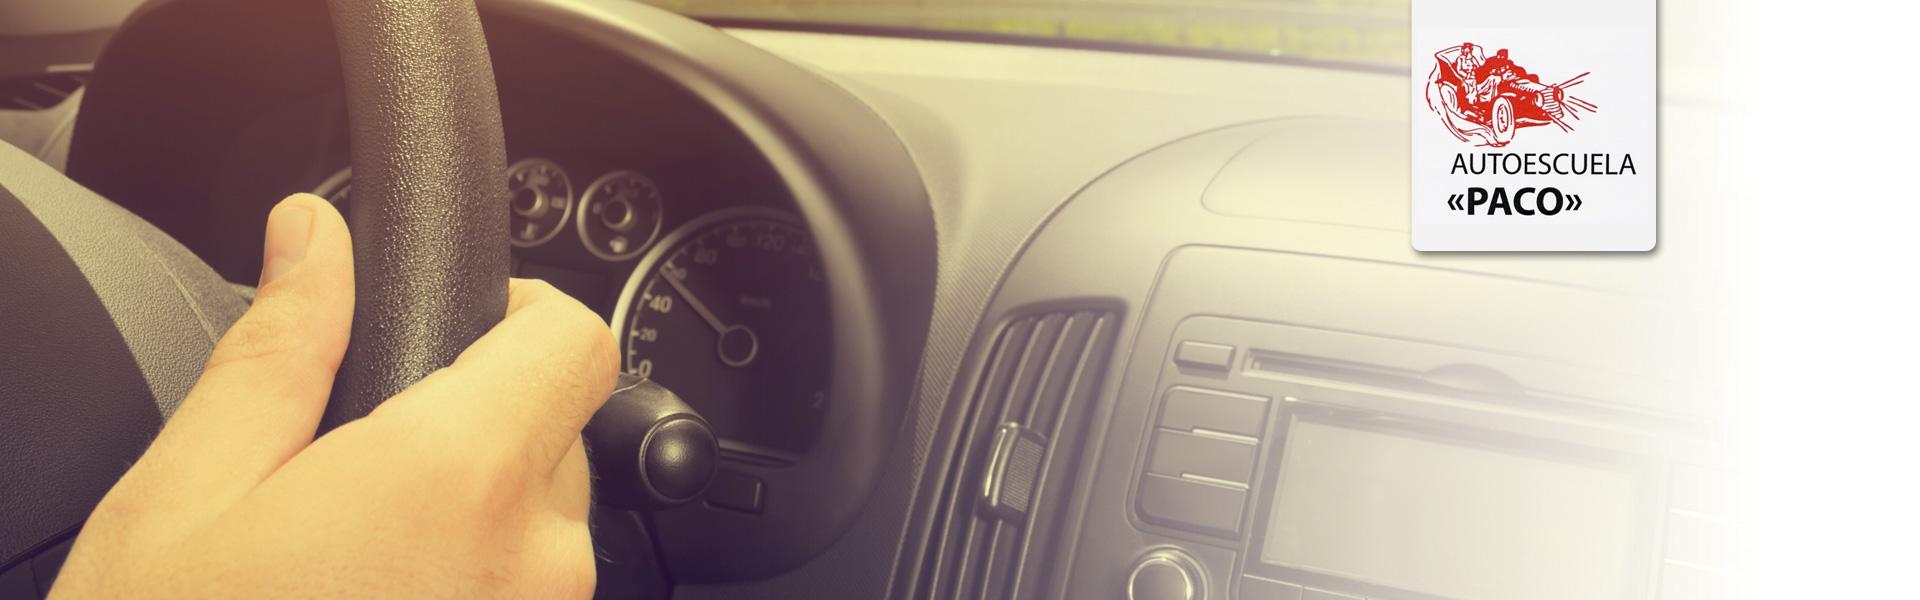 autoescuela-paco-fachada6